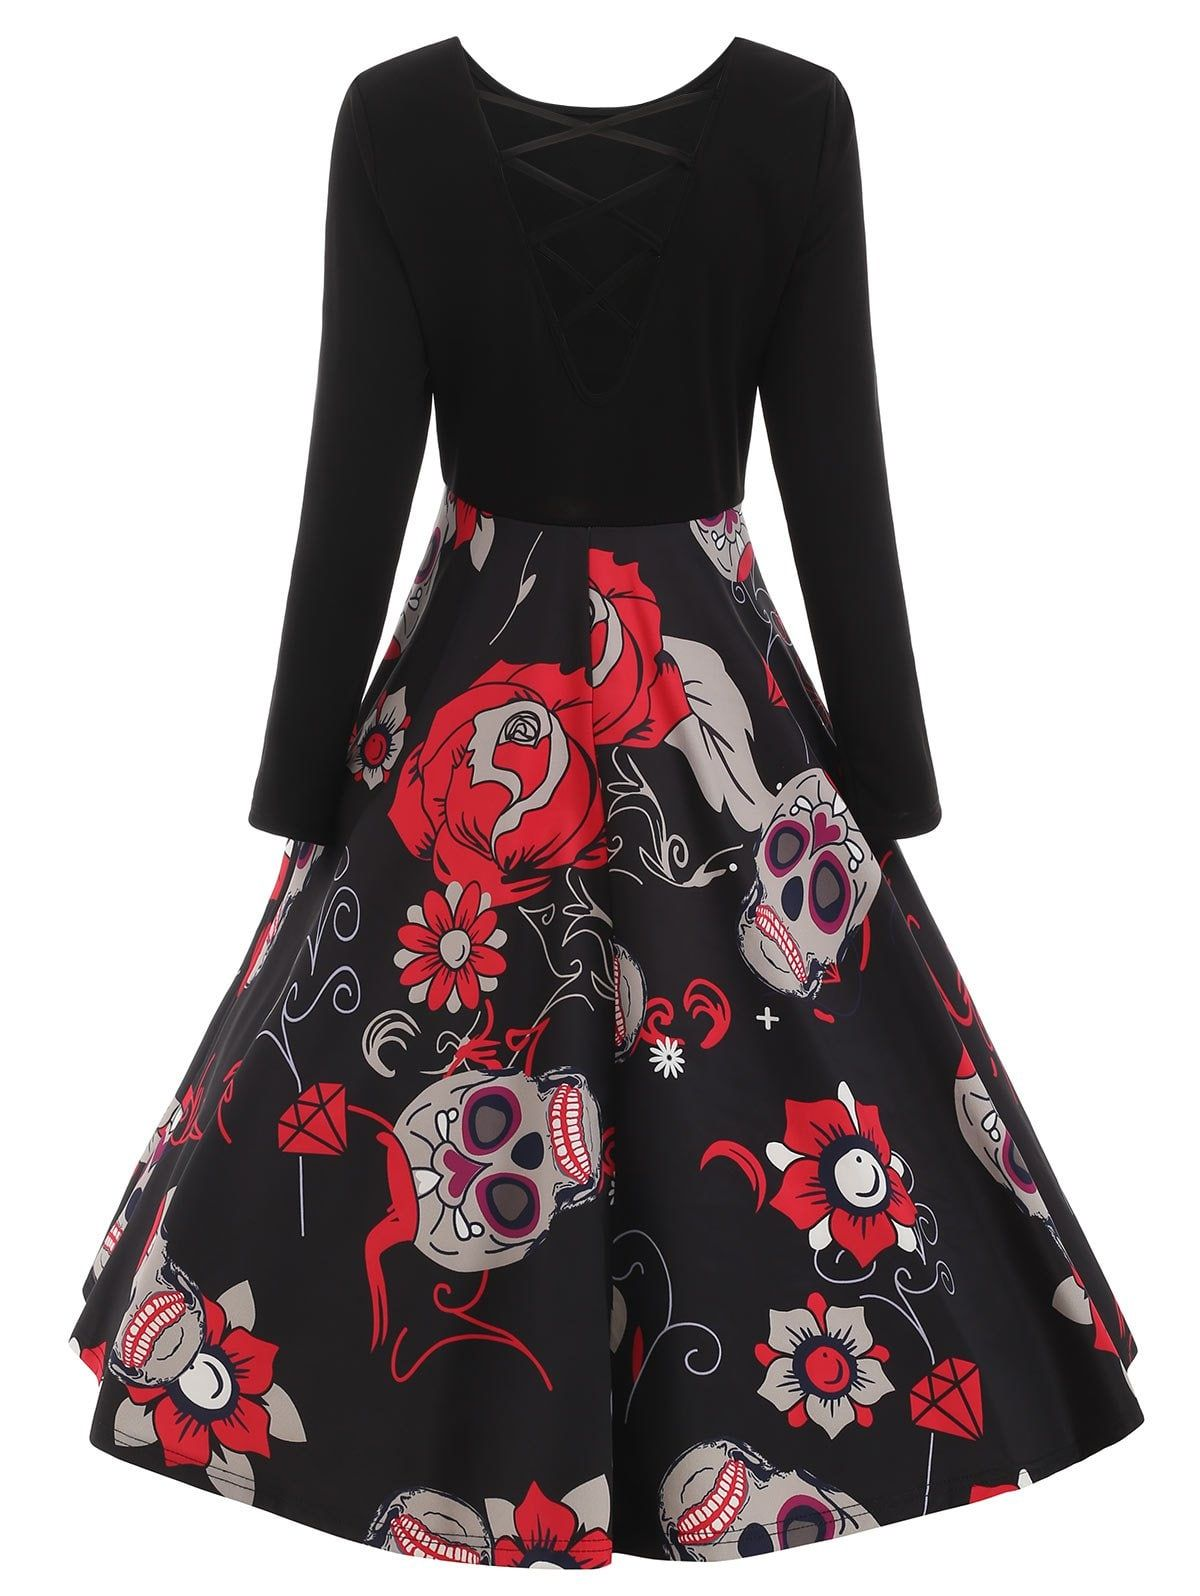 09aee10cc74 Sugar Skull Print Criss-cross Dress -